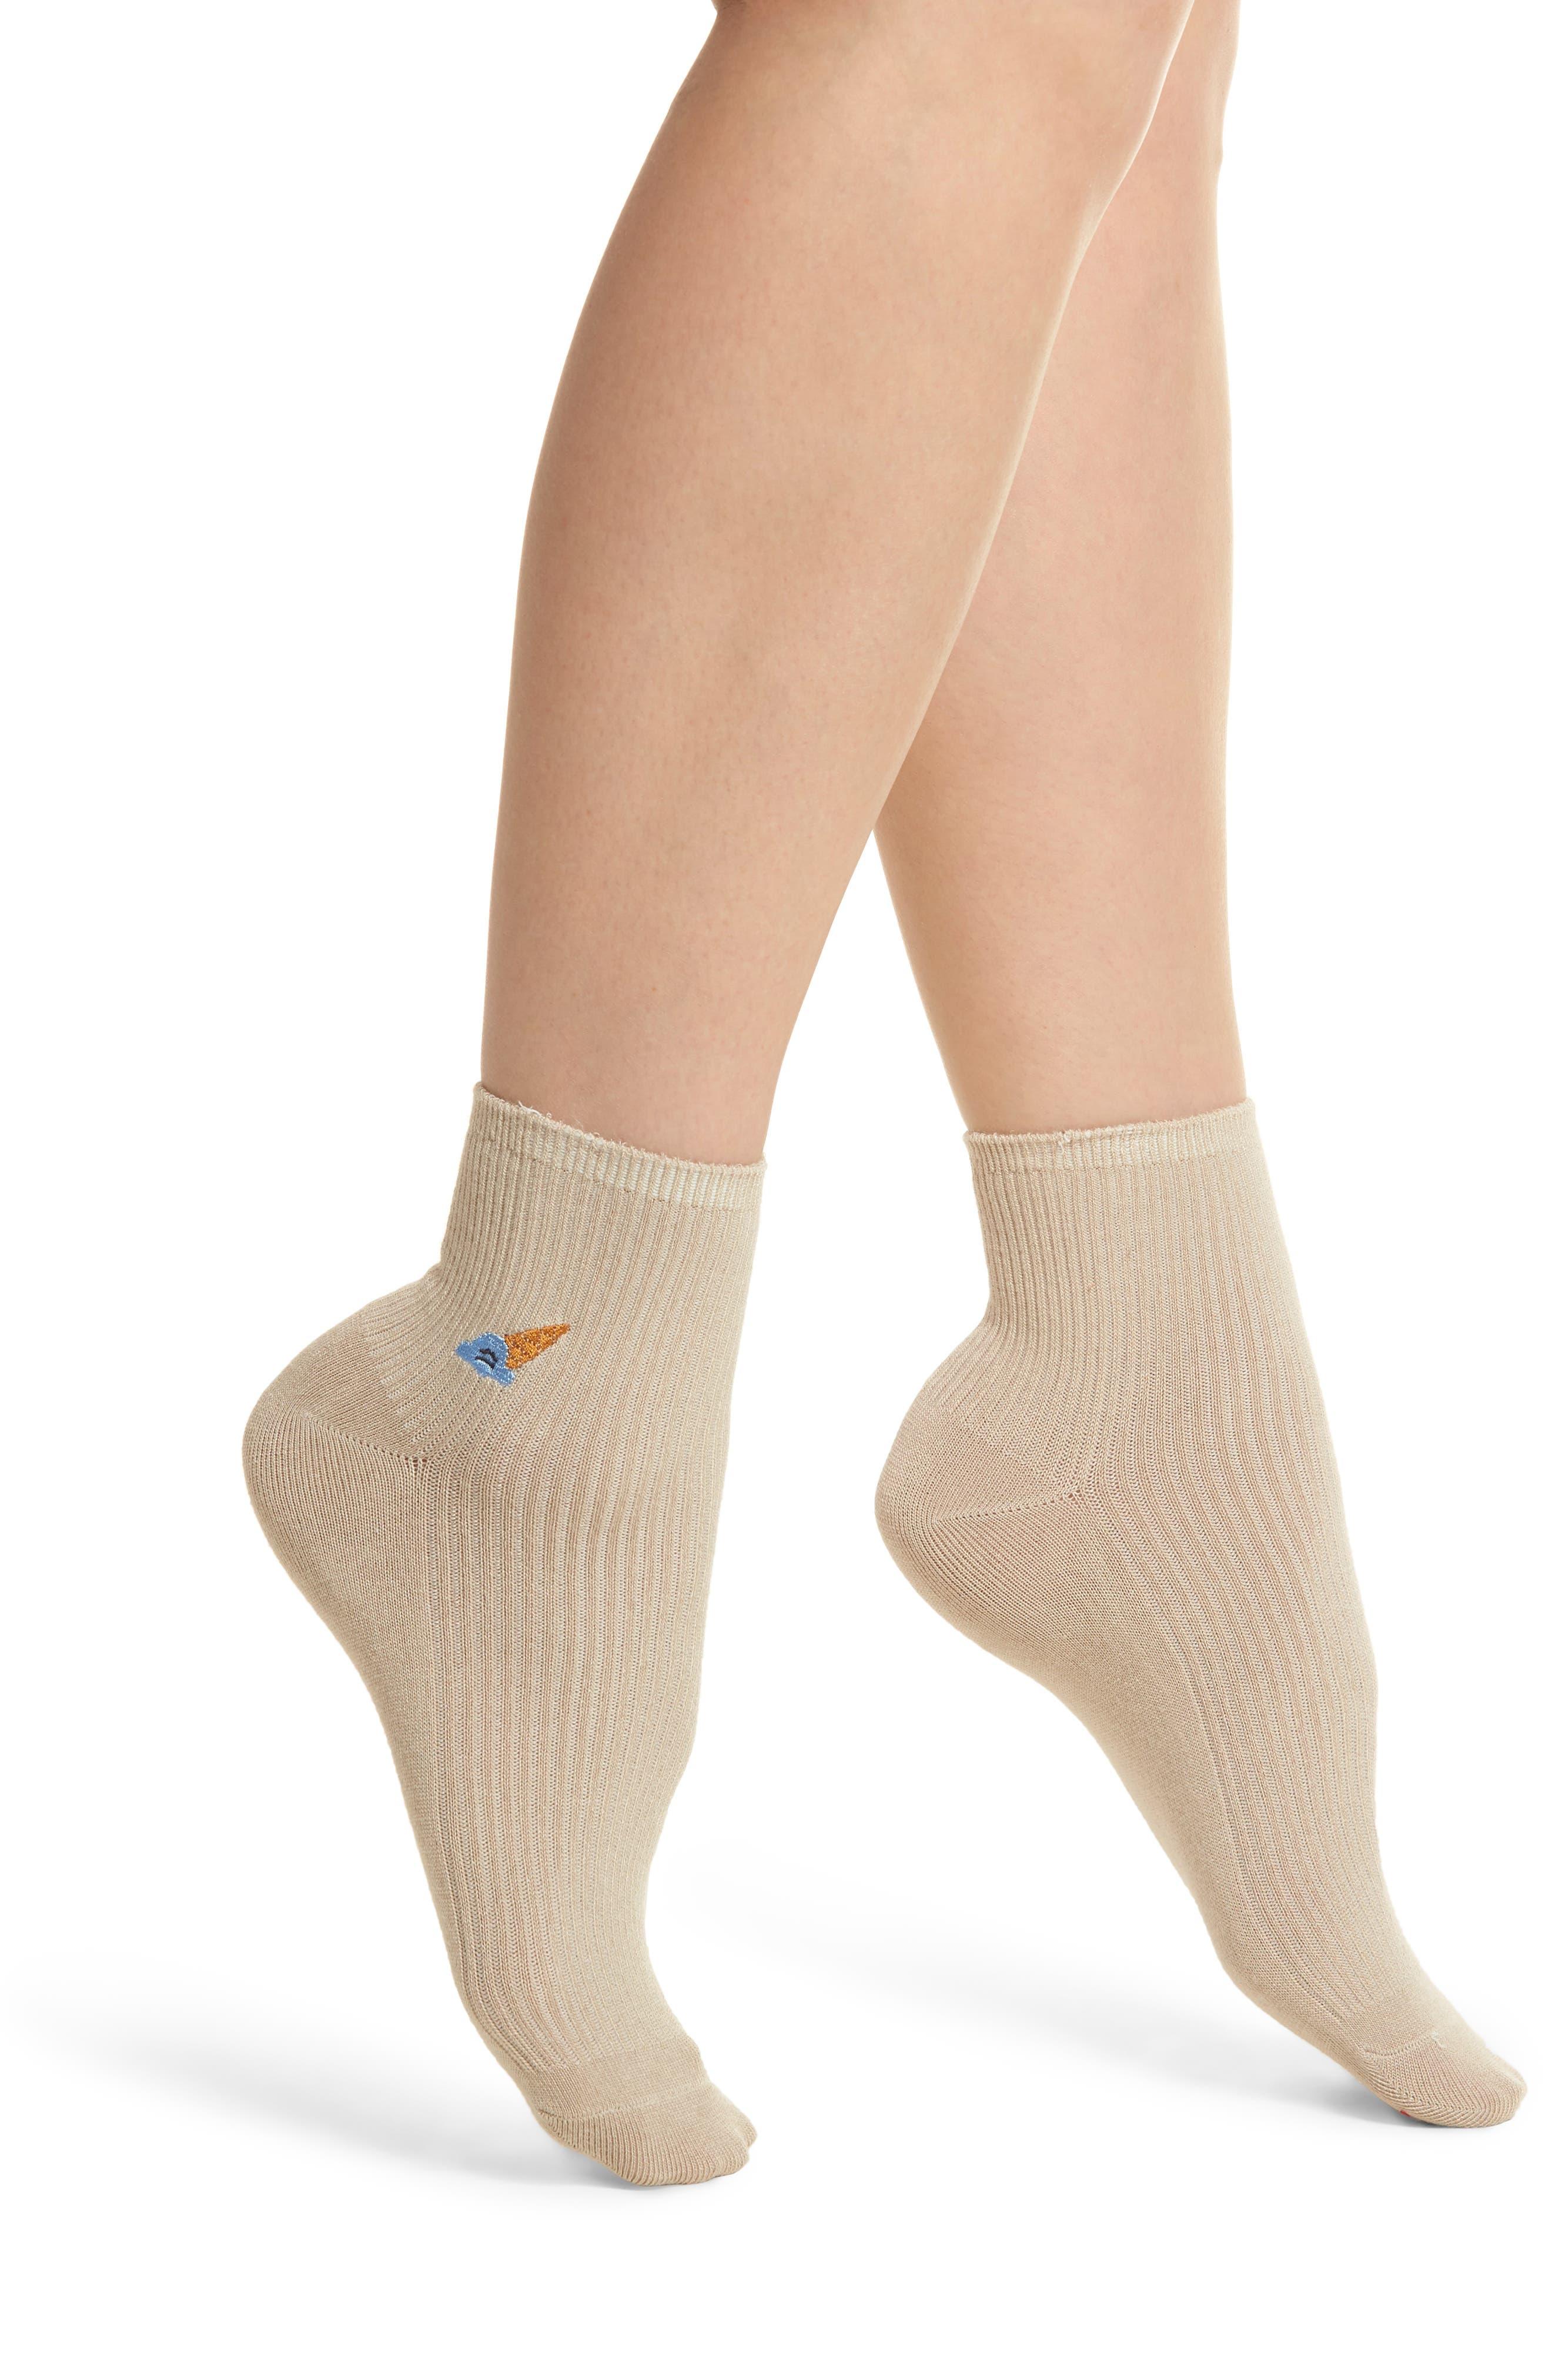 Coney Ankle Socks,                         Main,                         color, Oatmeal